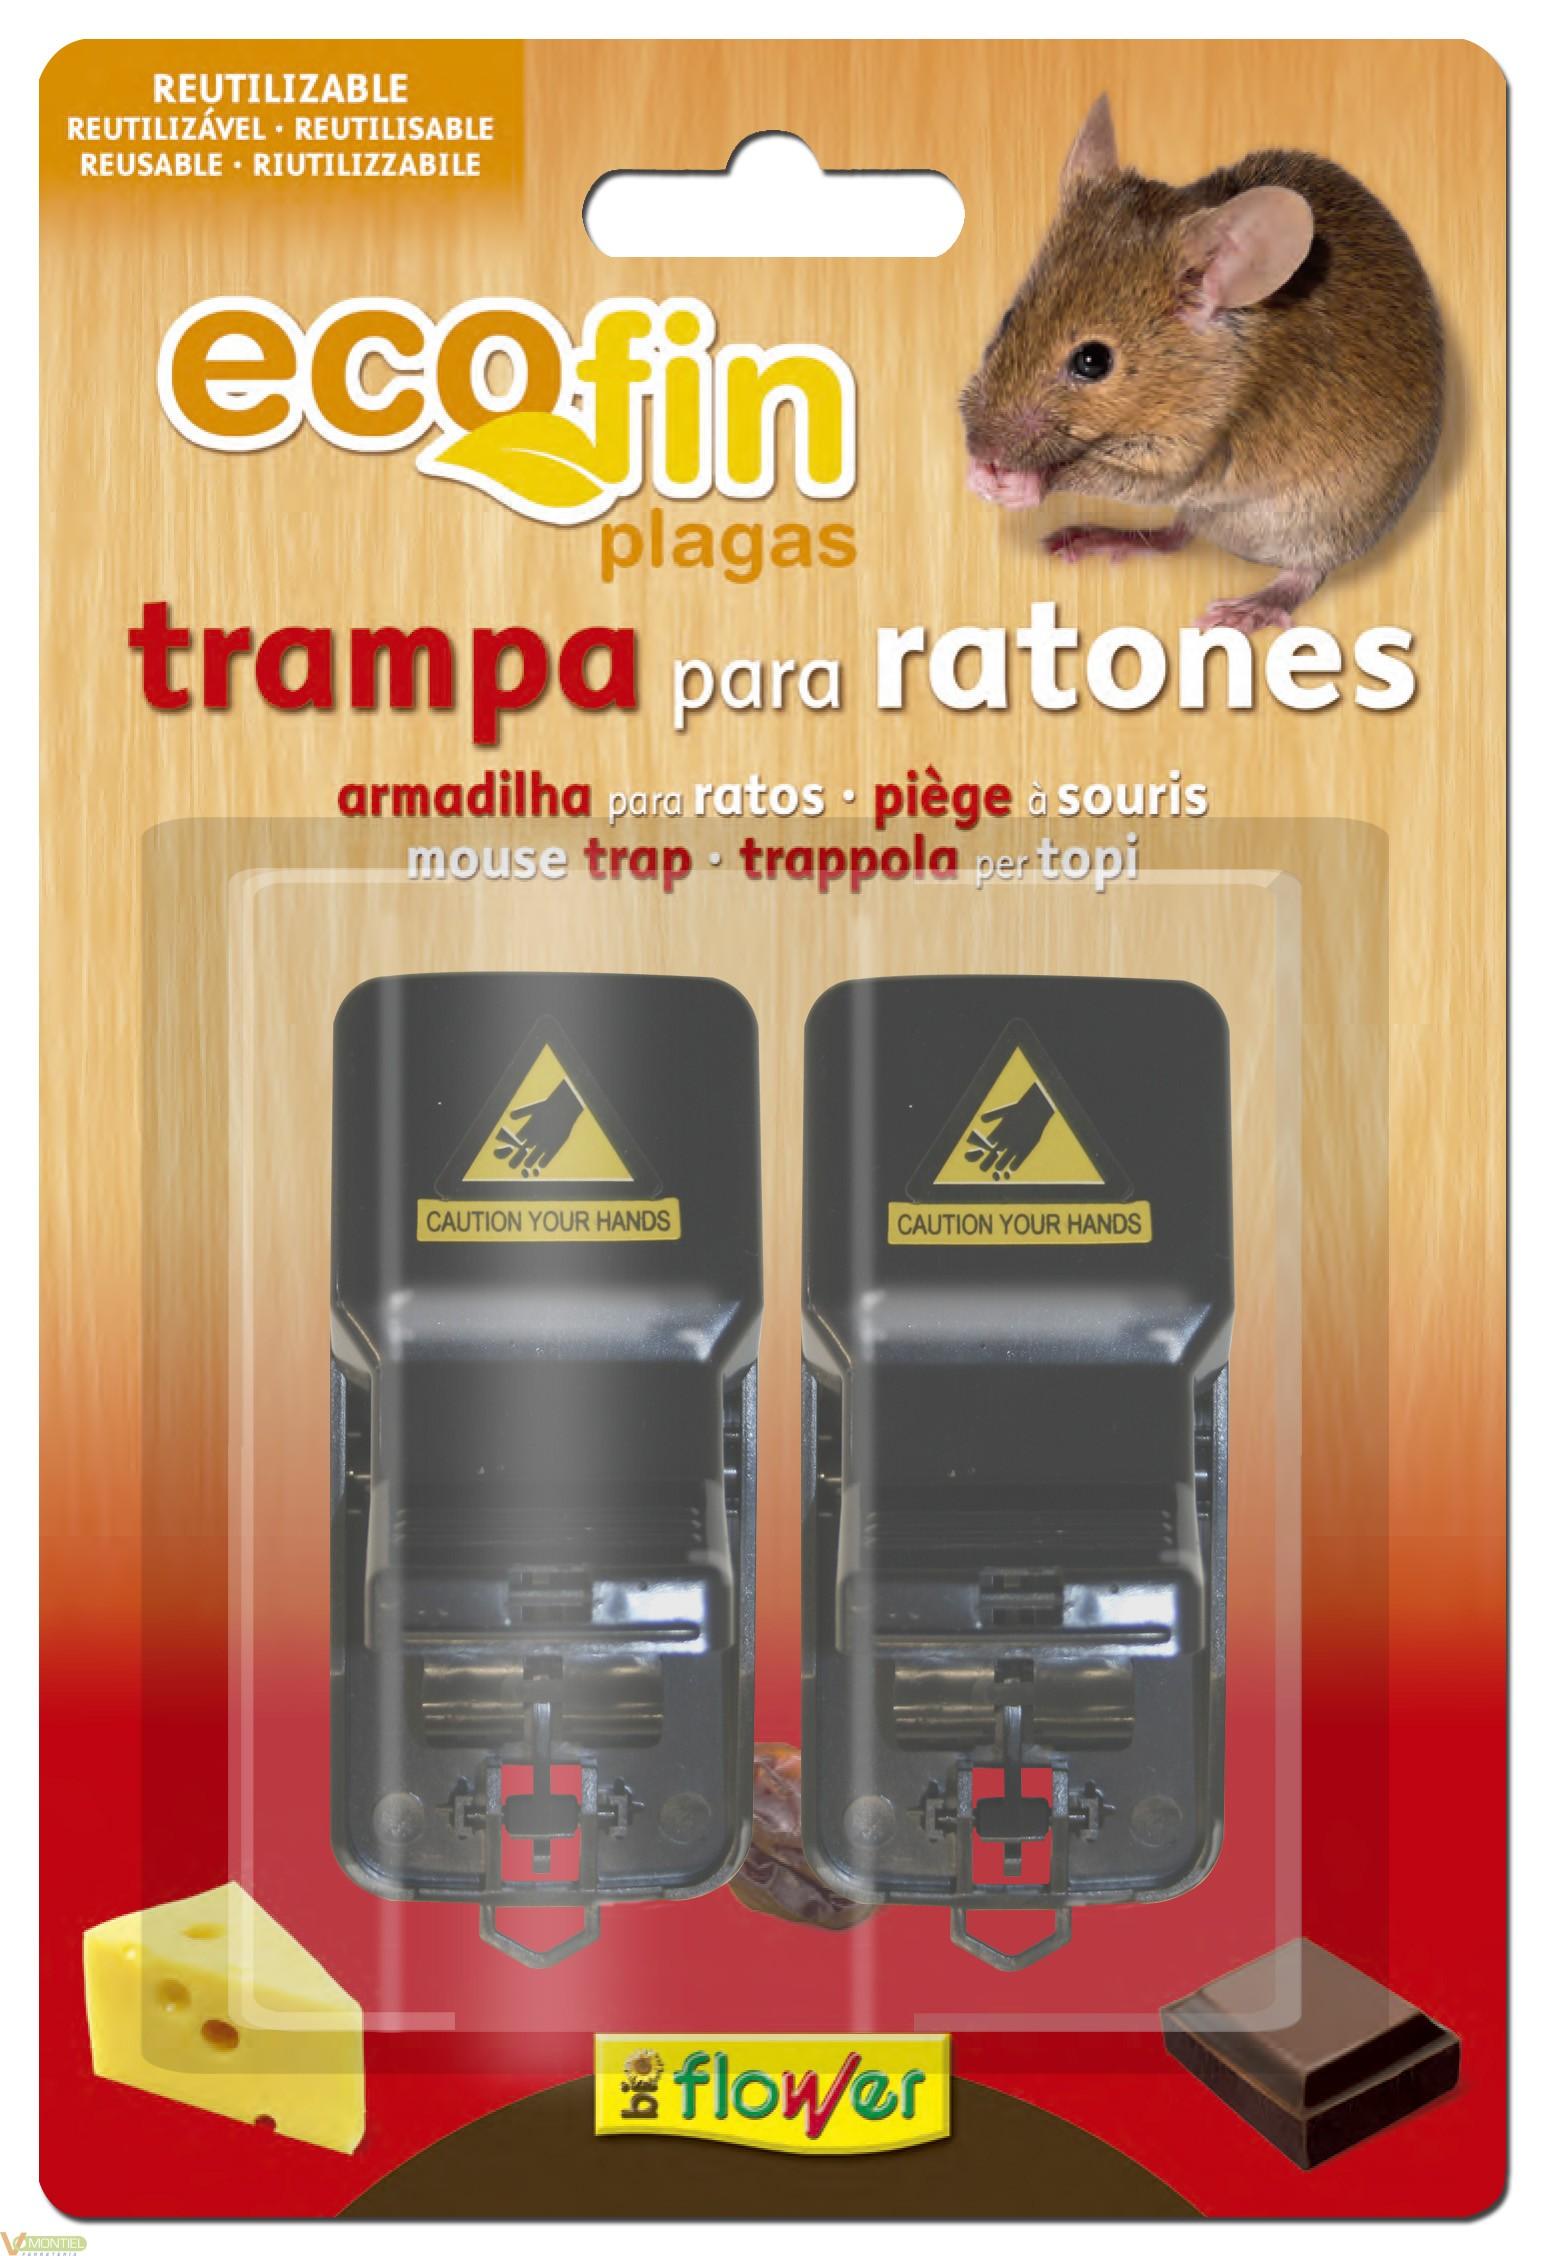 Trampa ratones mecanica ecofin-0